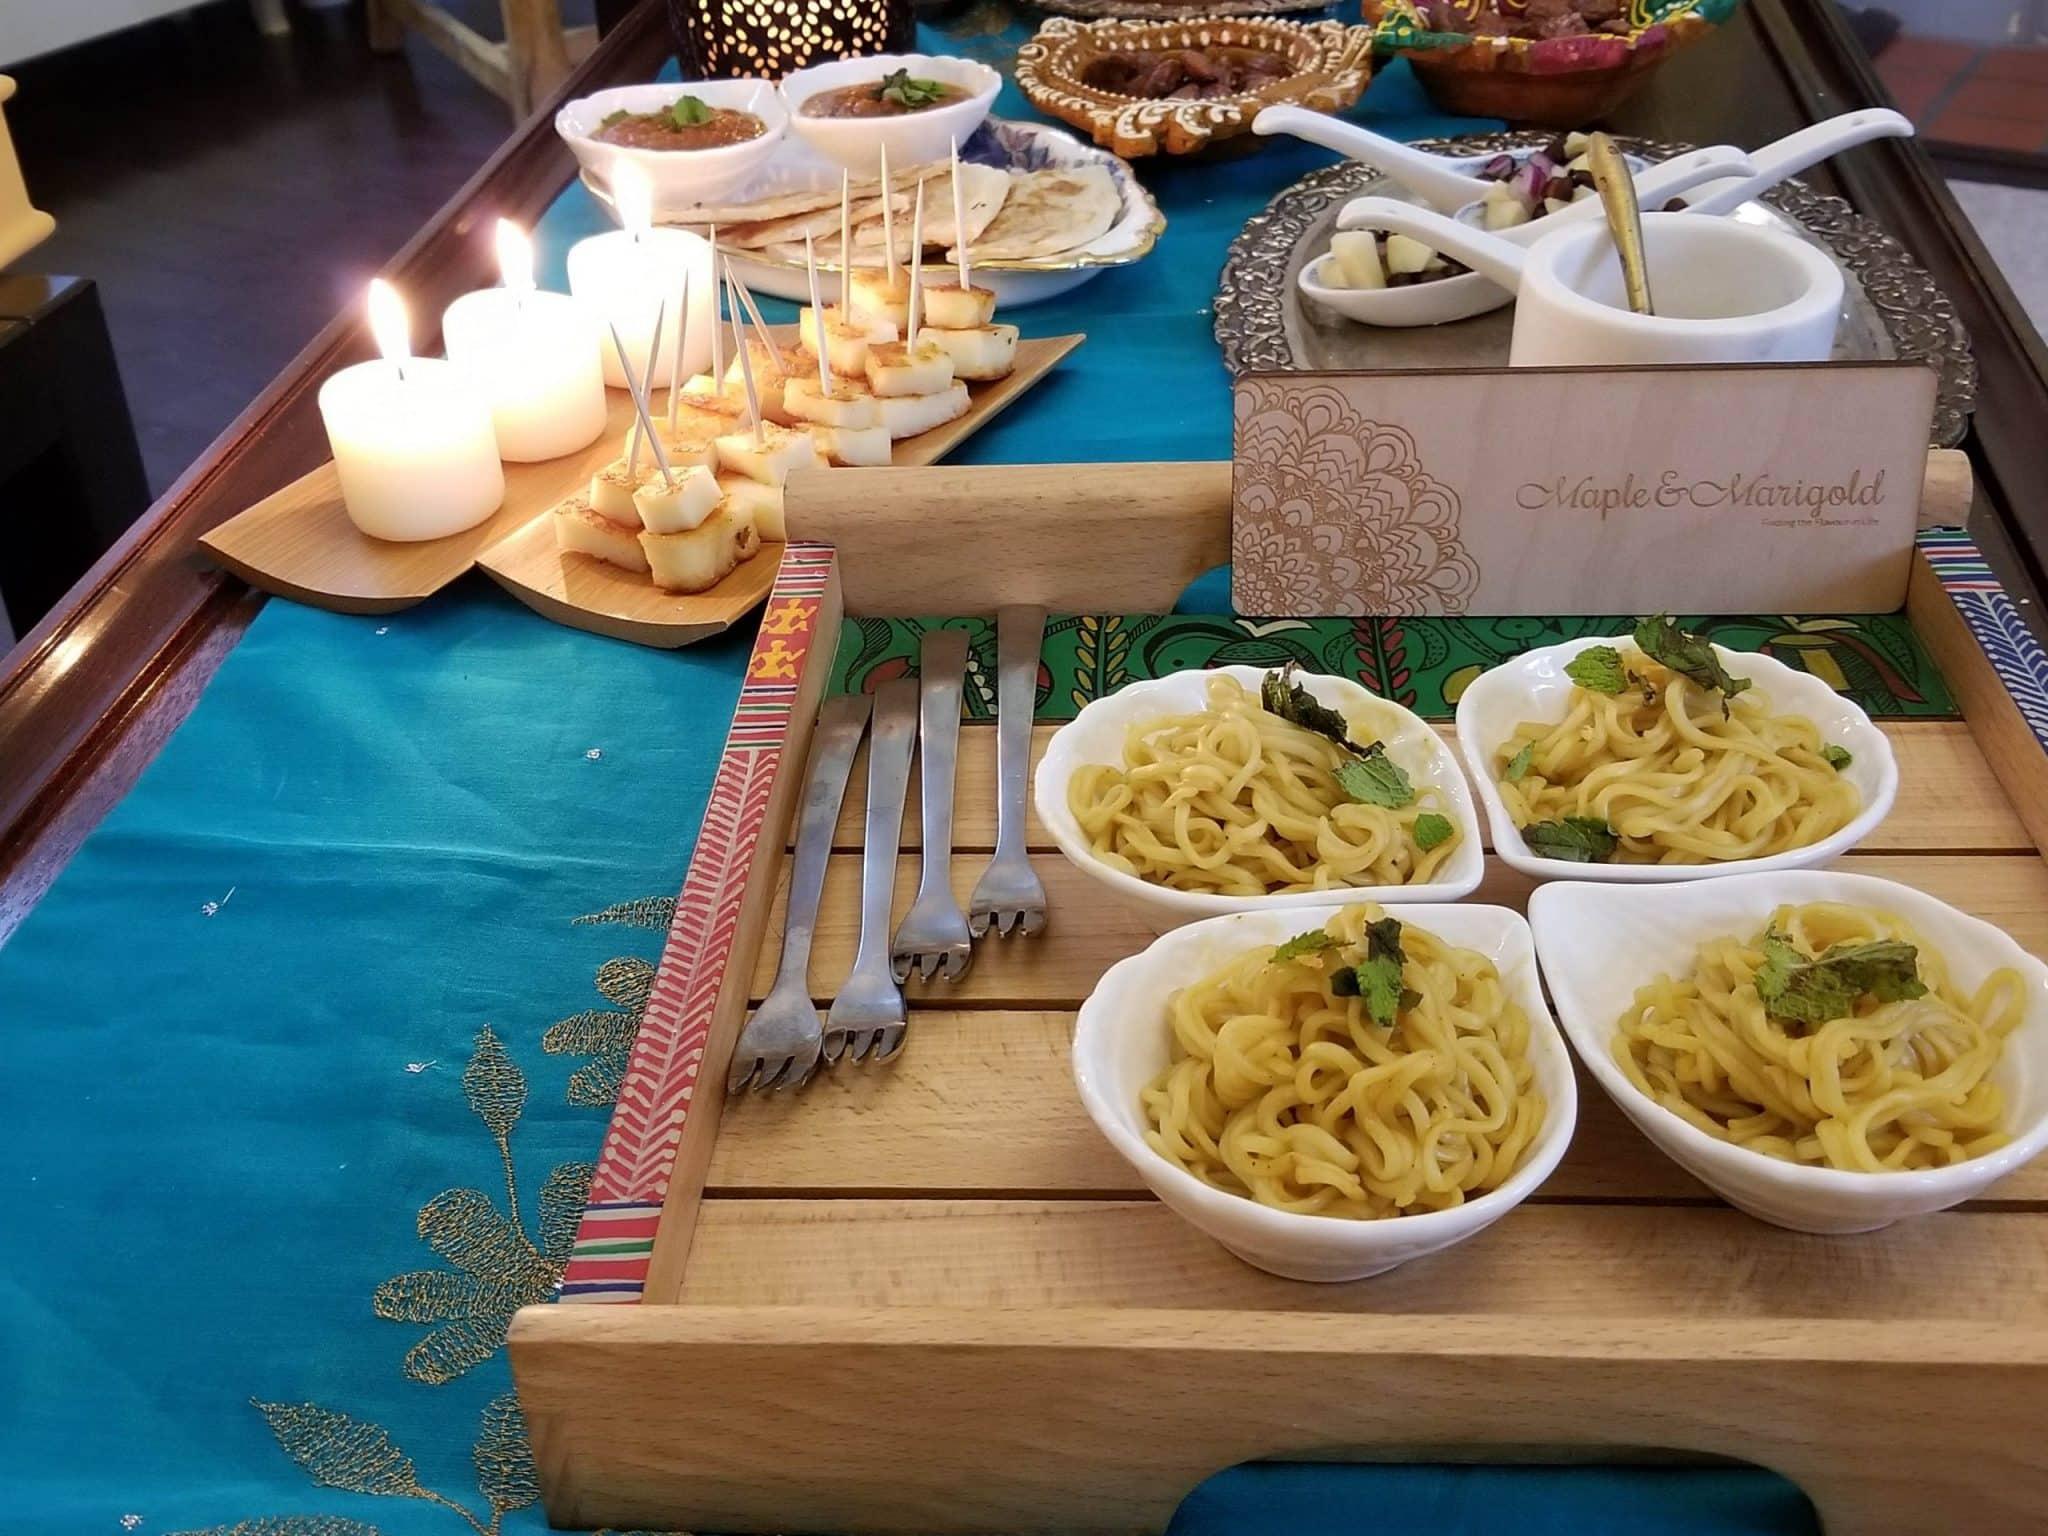 Happy Diwali   Genius Hacks to throw a stress free Diwali Party   Diwali Party Tips   Maple and Marigold